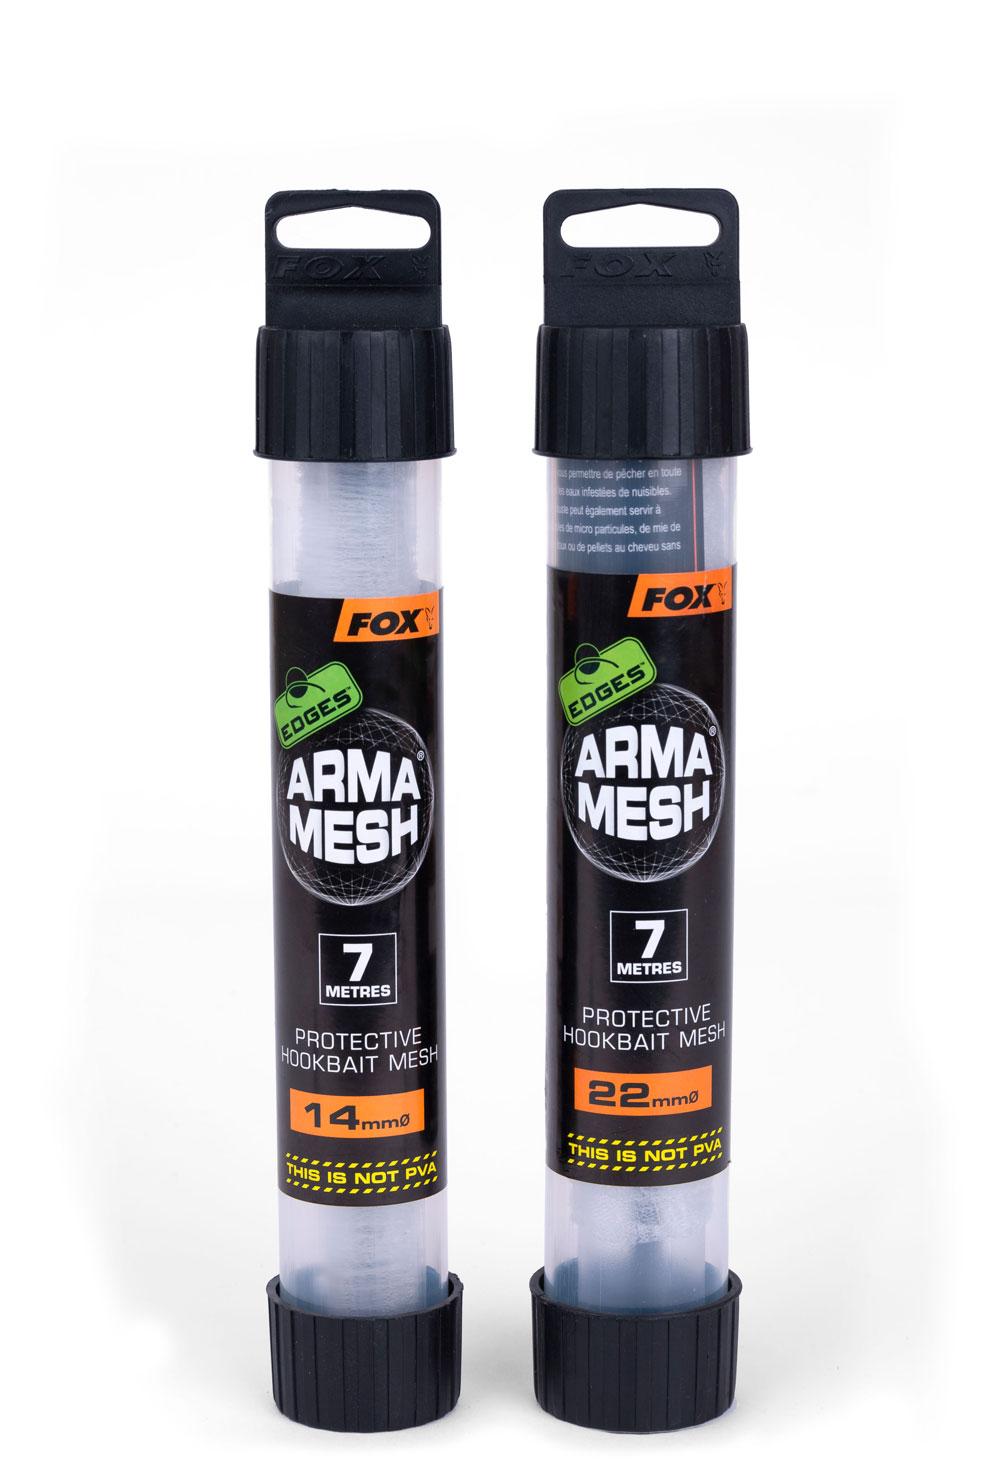 arma-mesh_14mm-22mmjpg